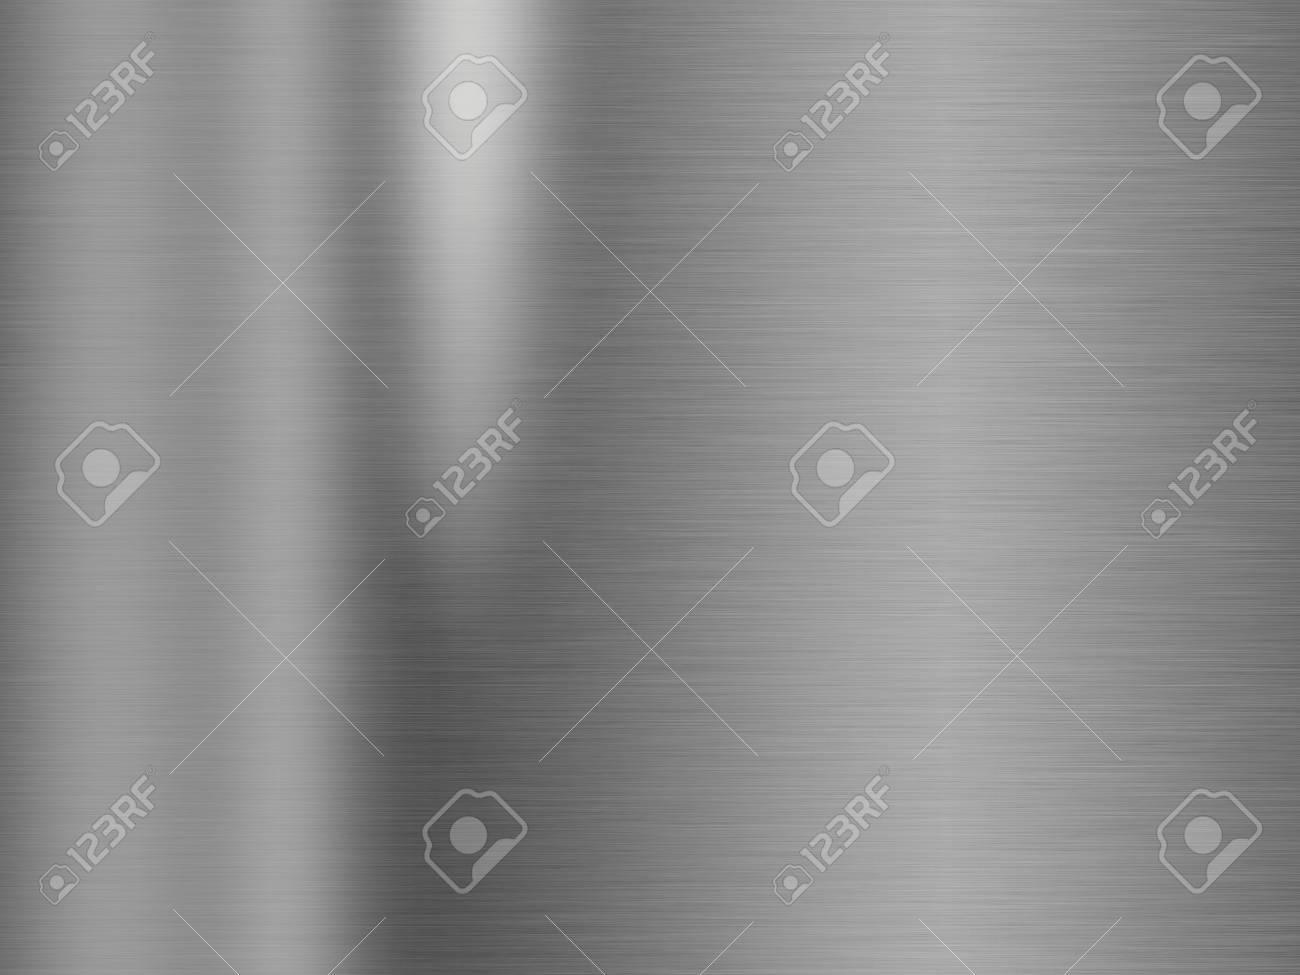 texture en acier inoxydable ou en métal texture de fond Banque d'images - 75076716